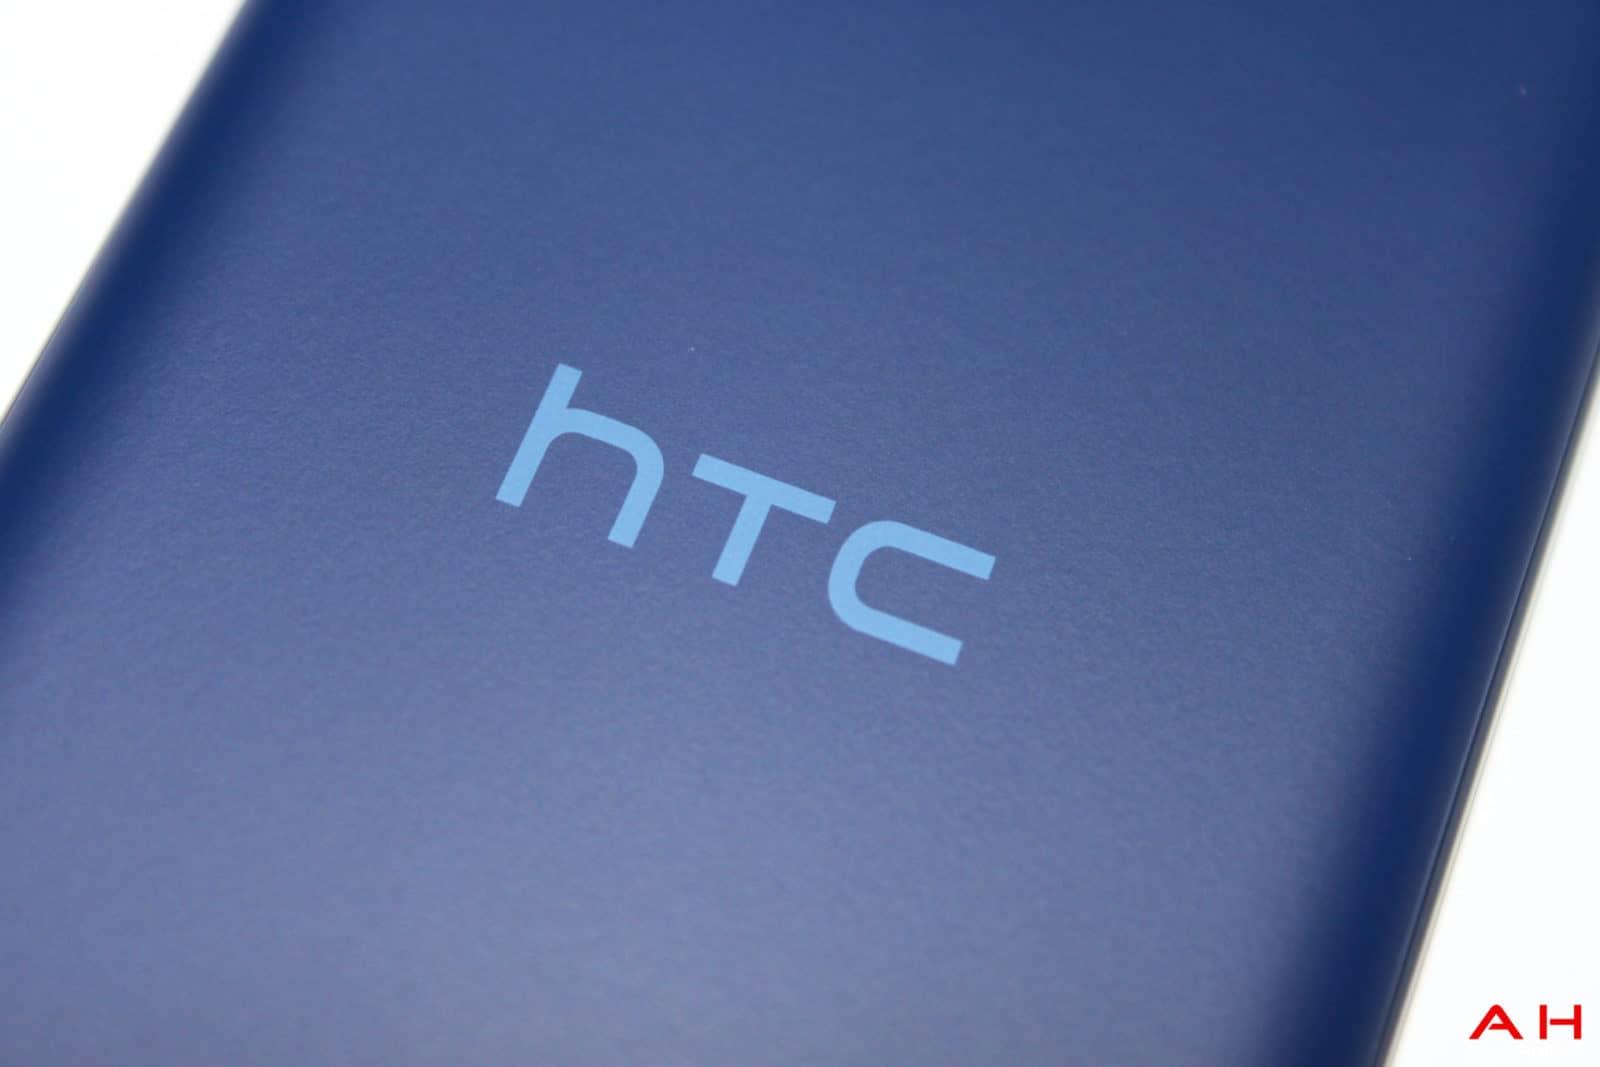 AH HTC DESIRE 510 -5 LOGO